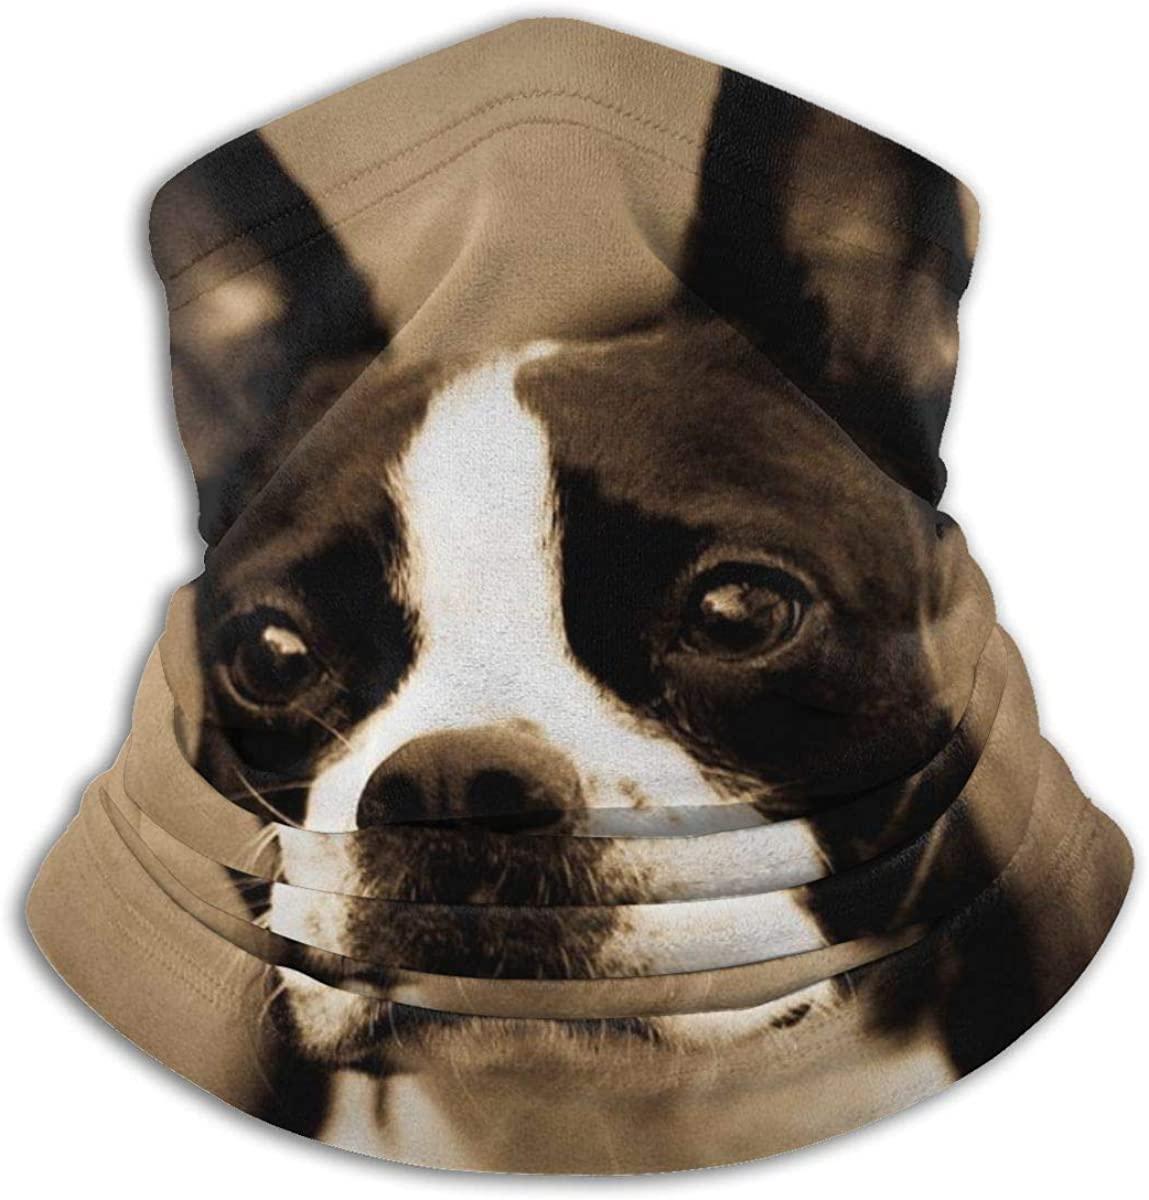 Face Mask, Neck Gaiter, Boston Terrier Dog Bandana, Balaclava Windproof Anti Dust Magic Scarf for Women Men